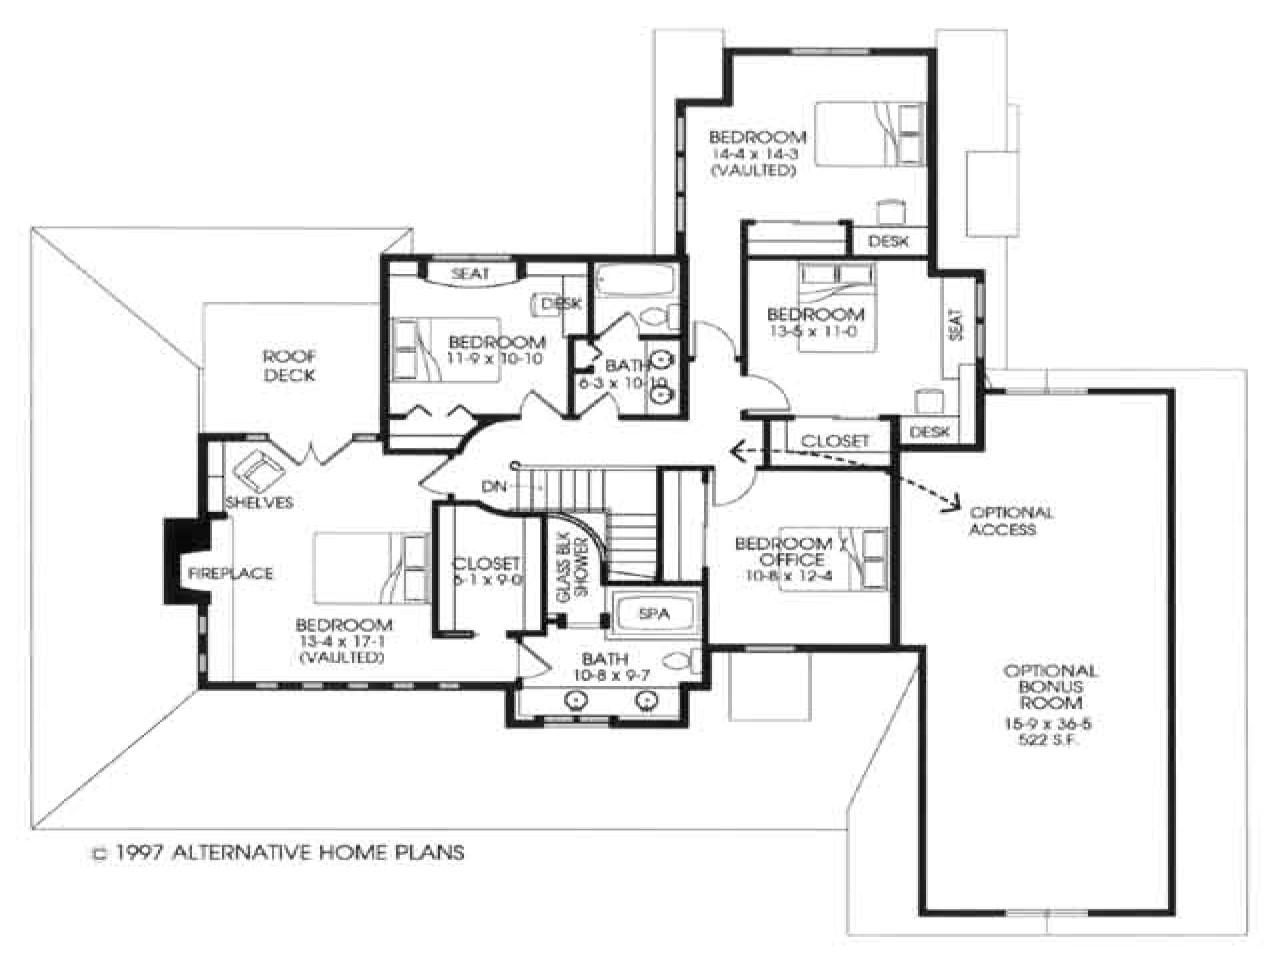 alternative housing plans